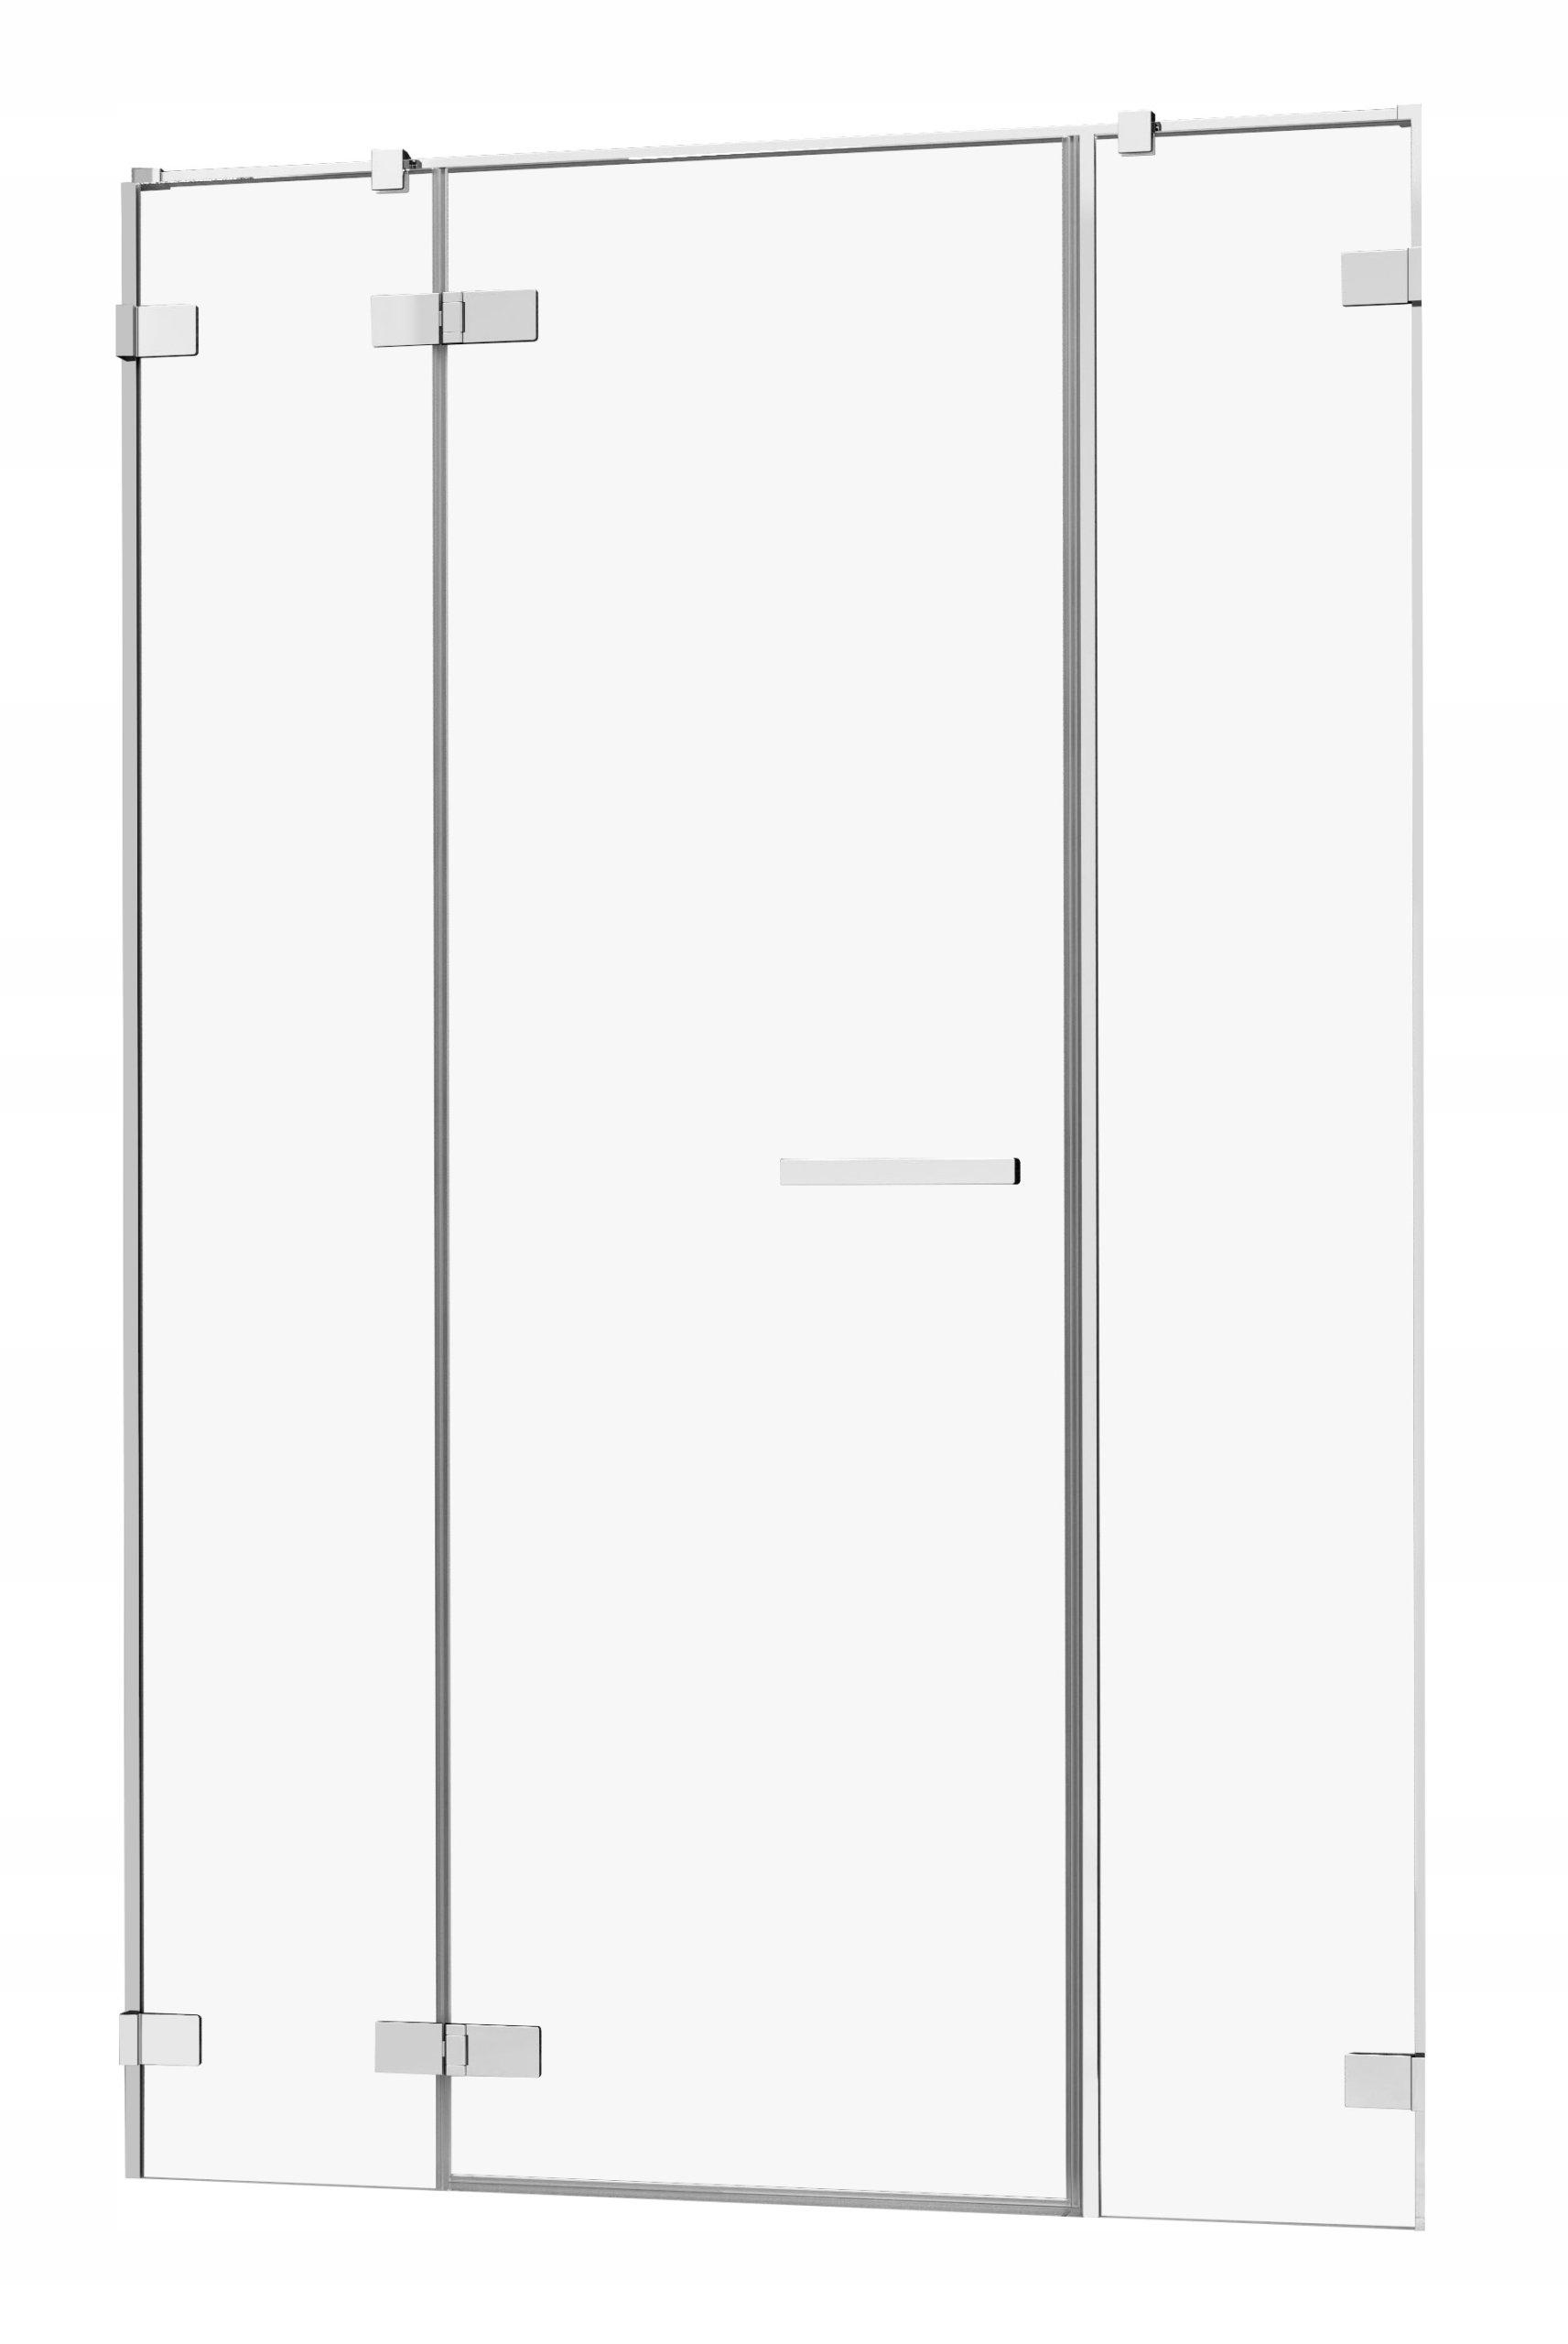 Sprchové dvere Arta DWJS 130x200 RADAWAY